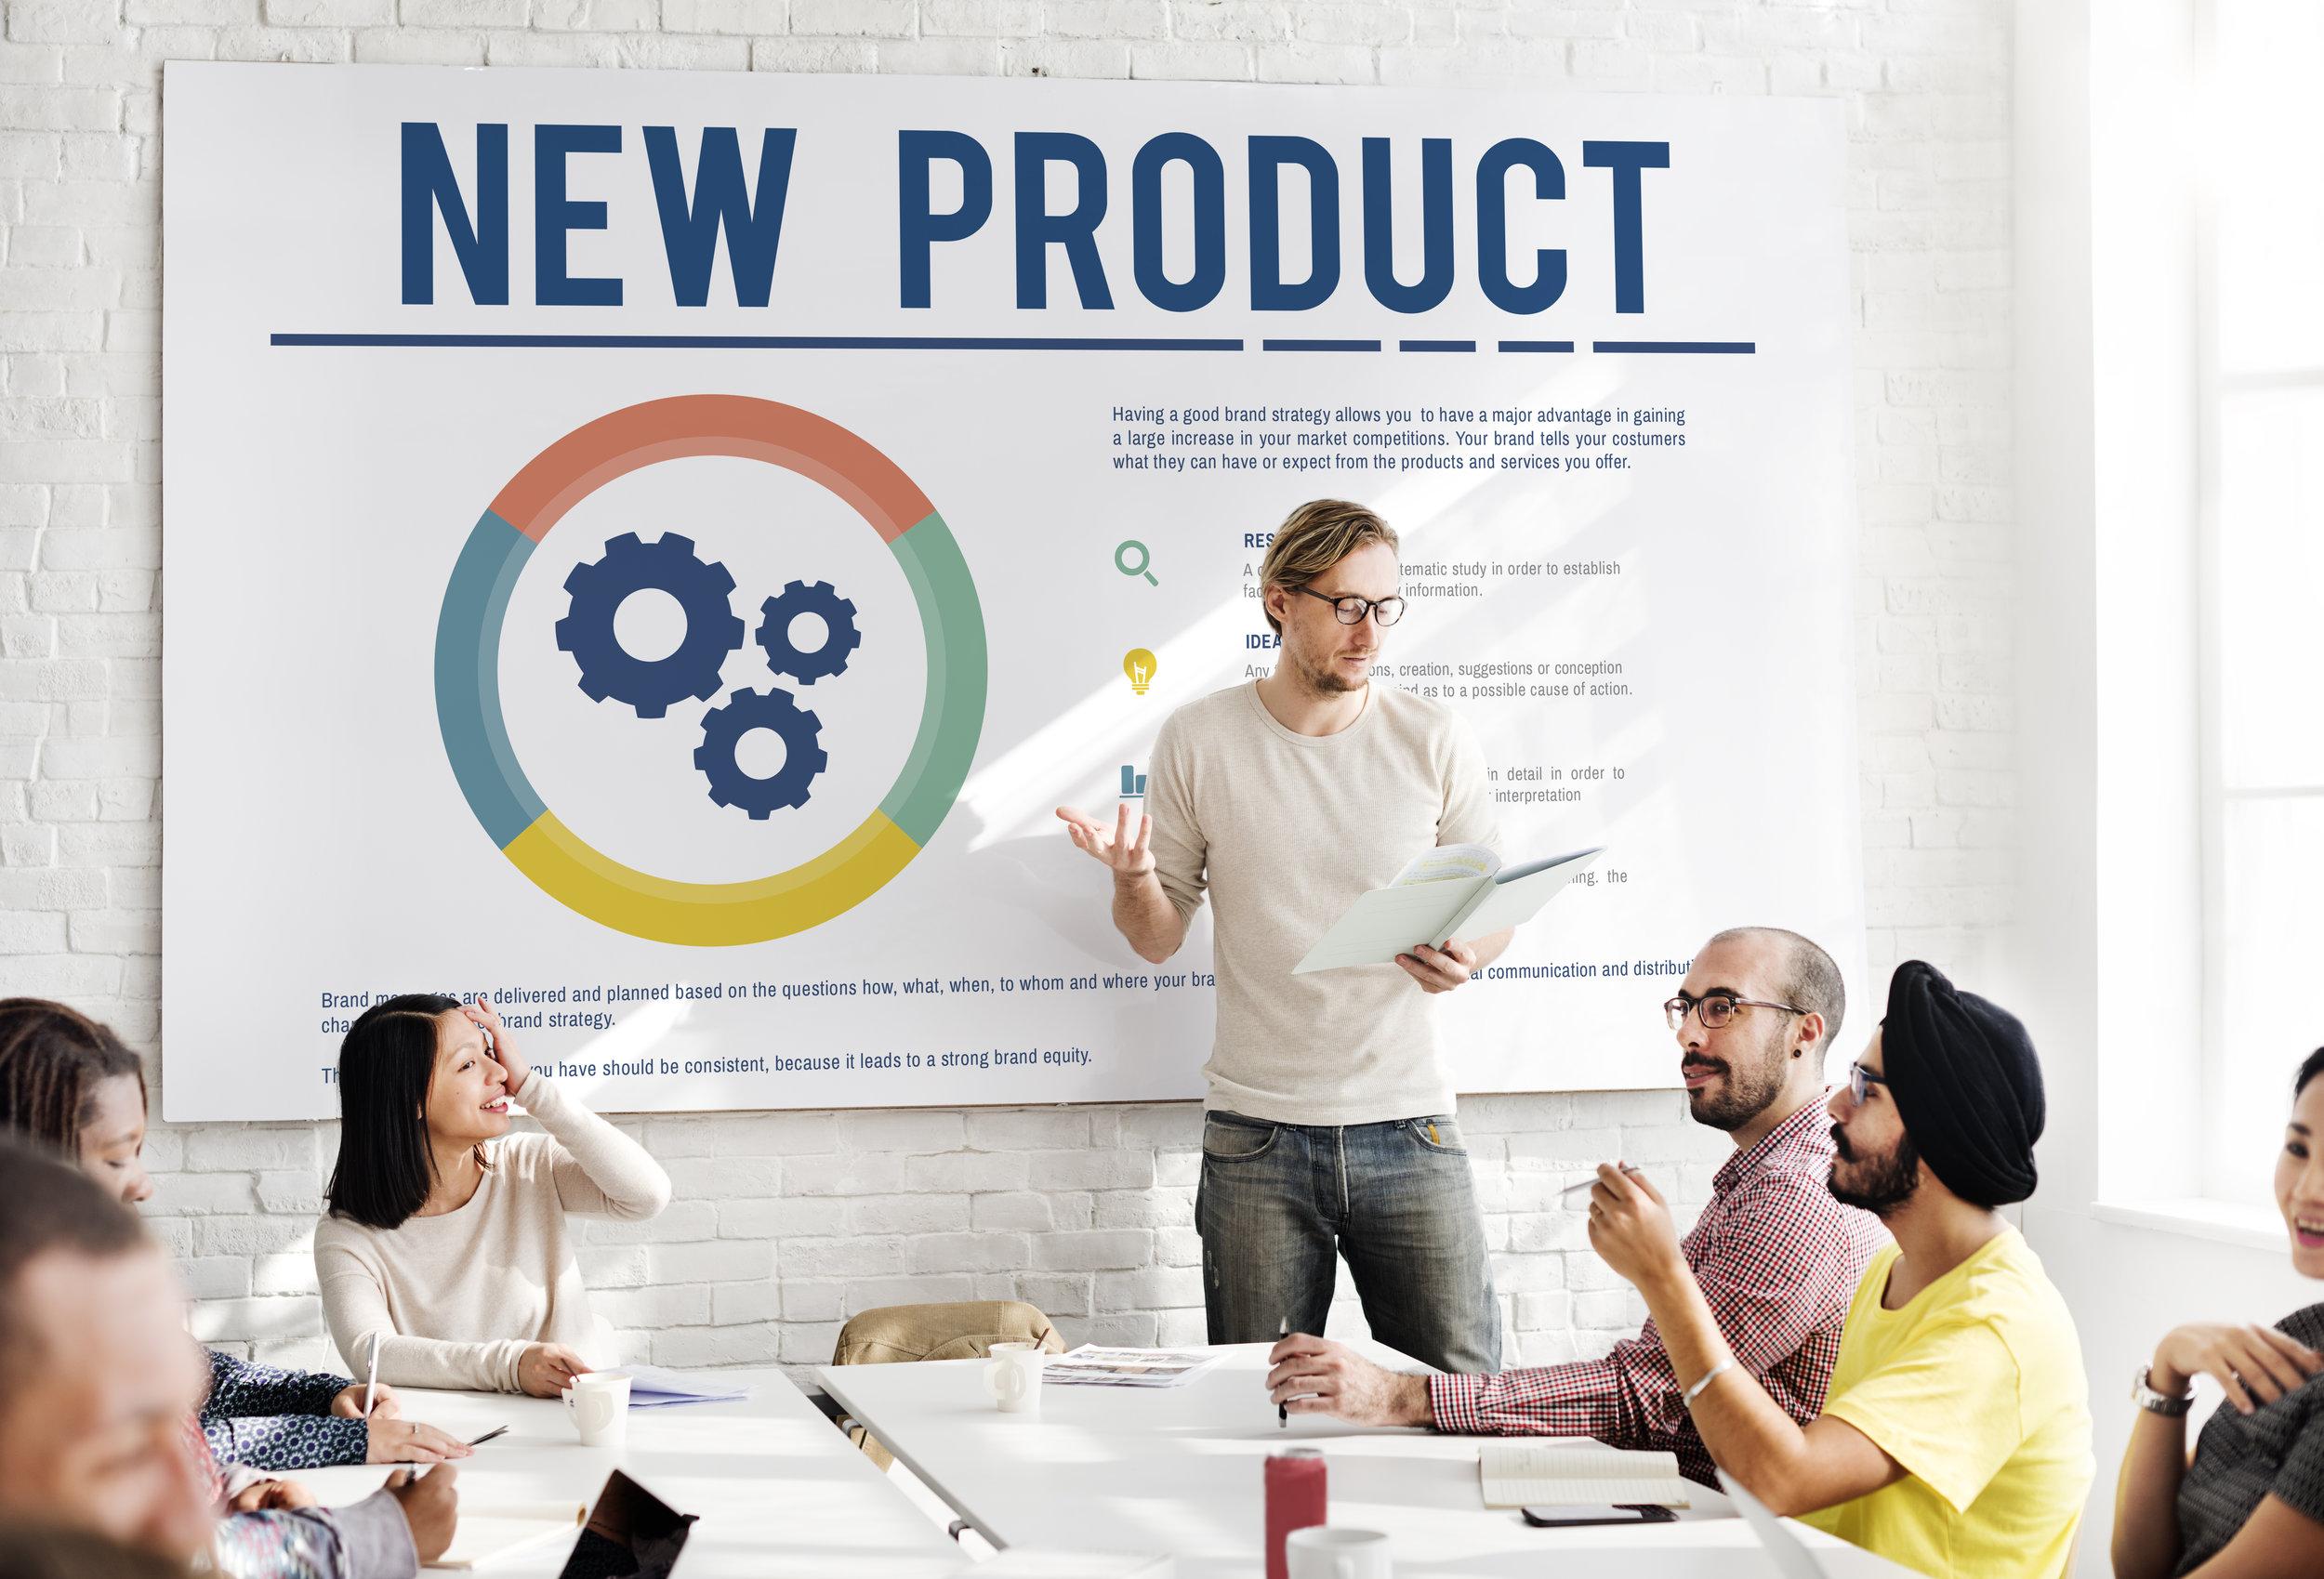 new_product_PP.jpg